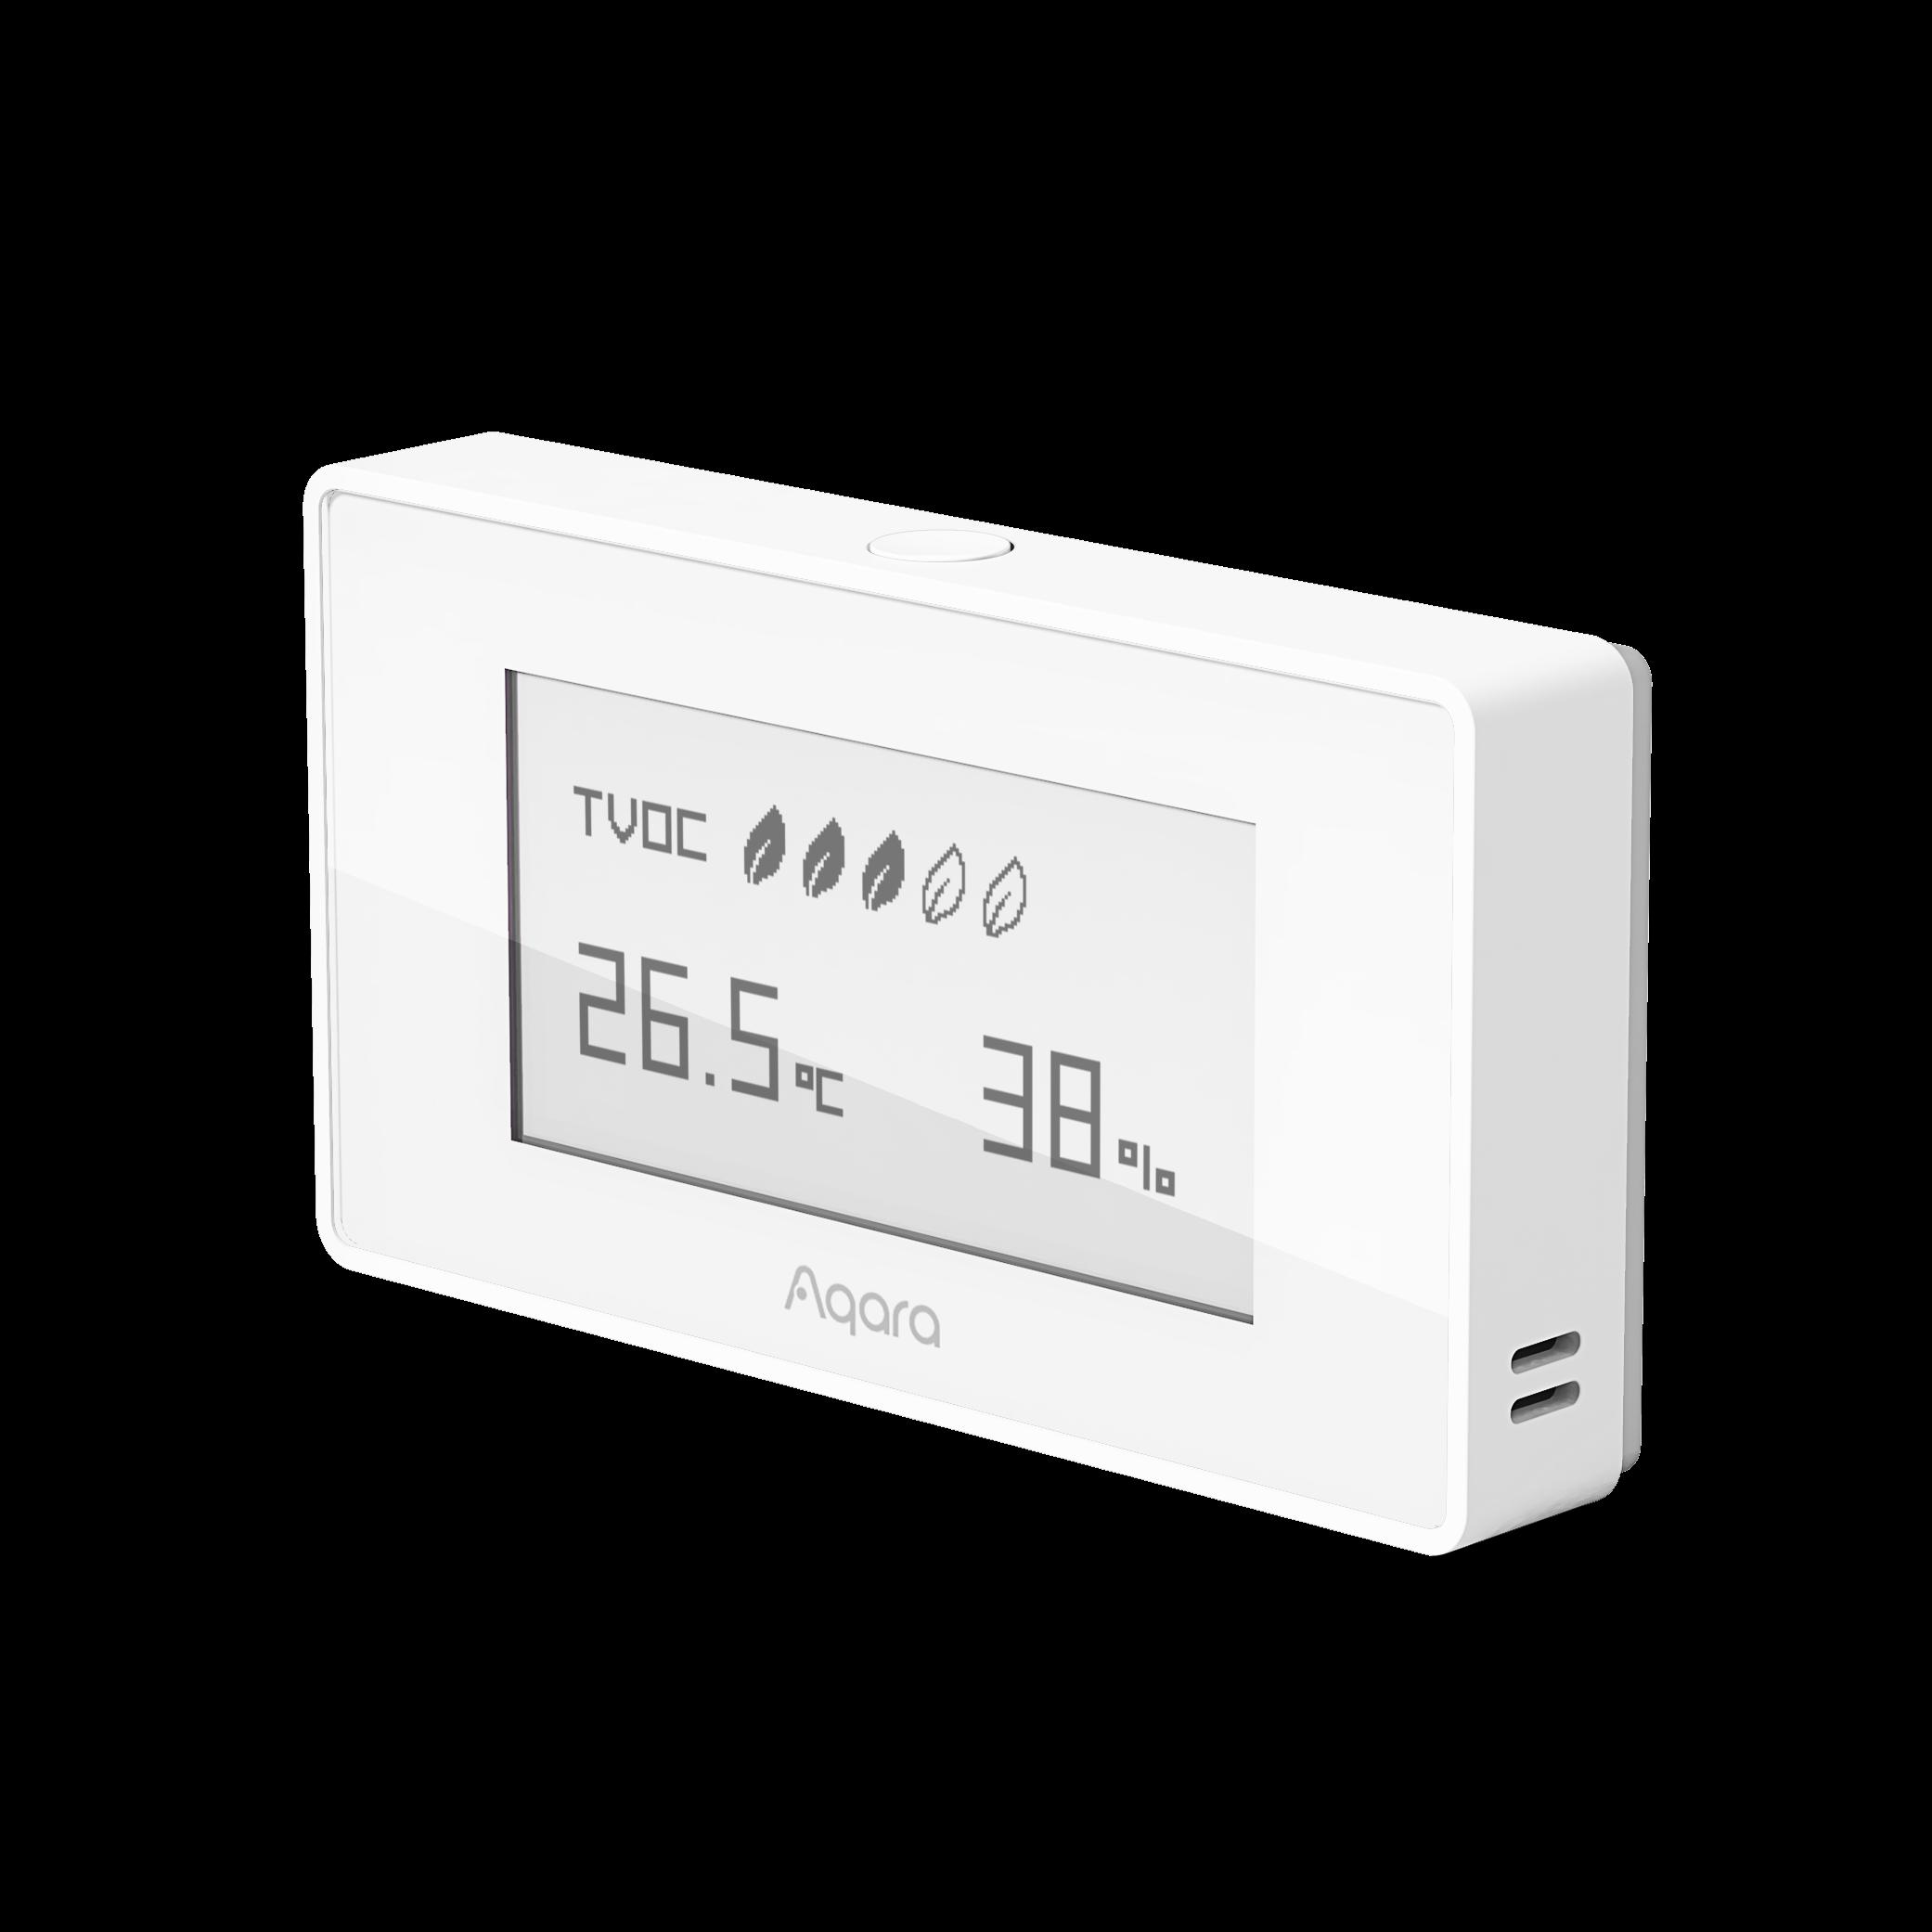 TVOC Air Quality Monitor